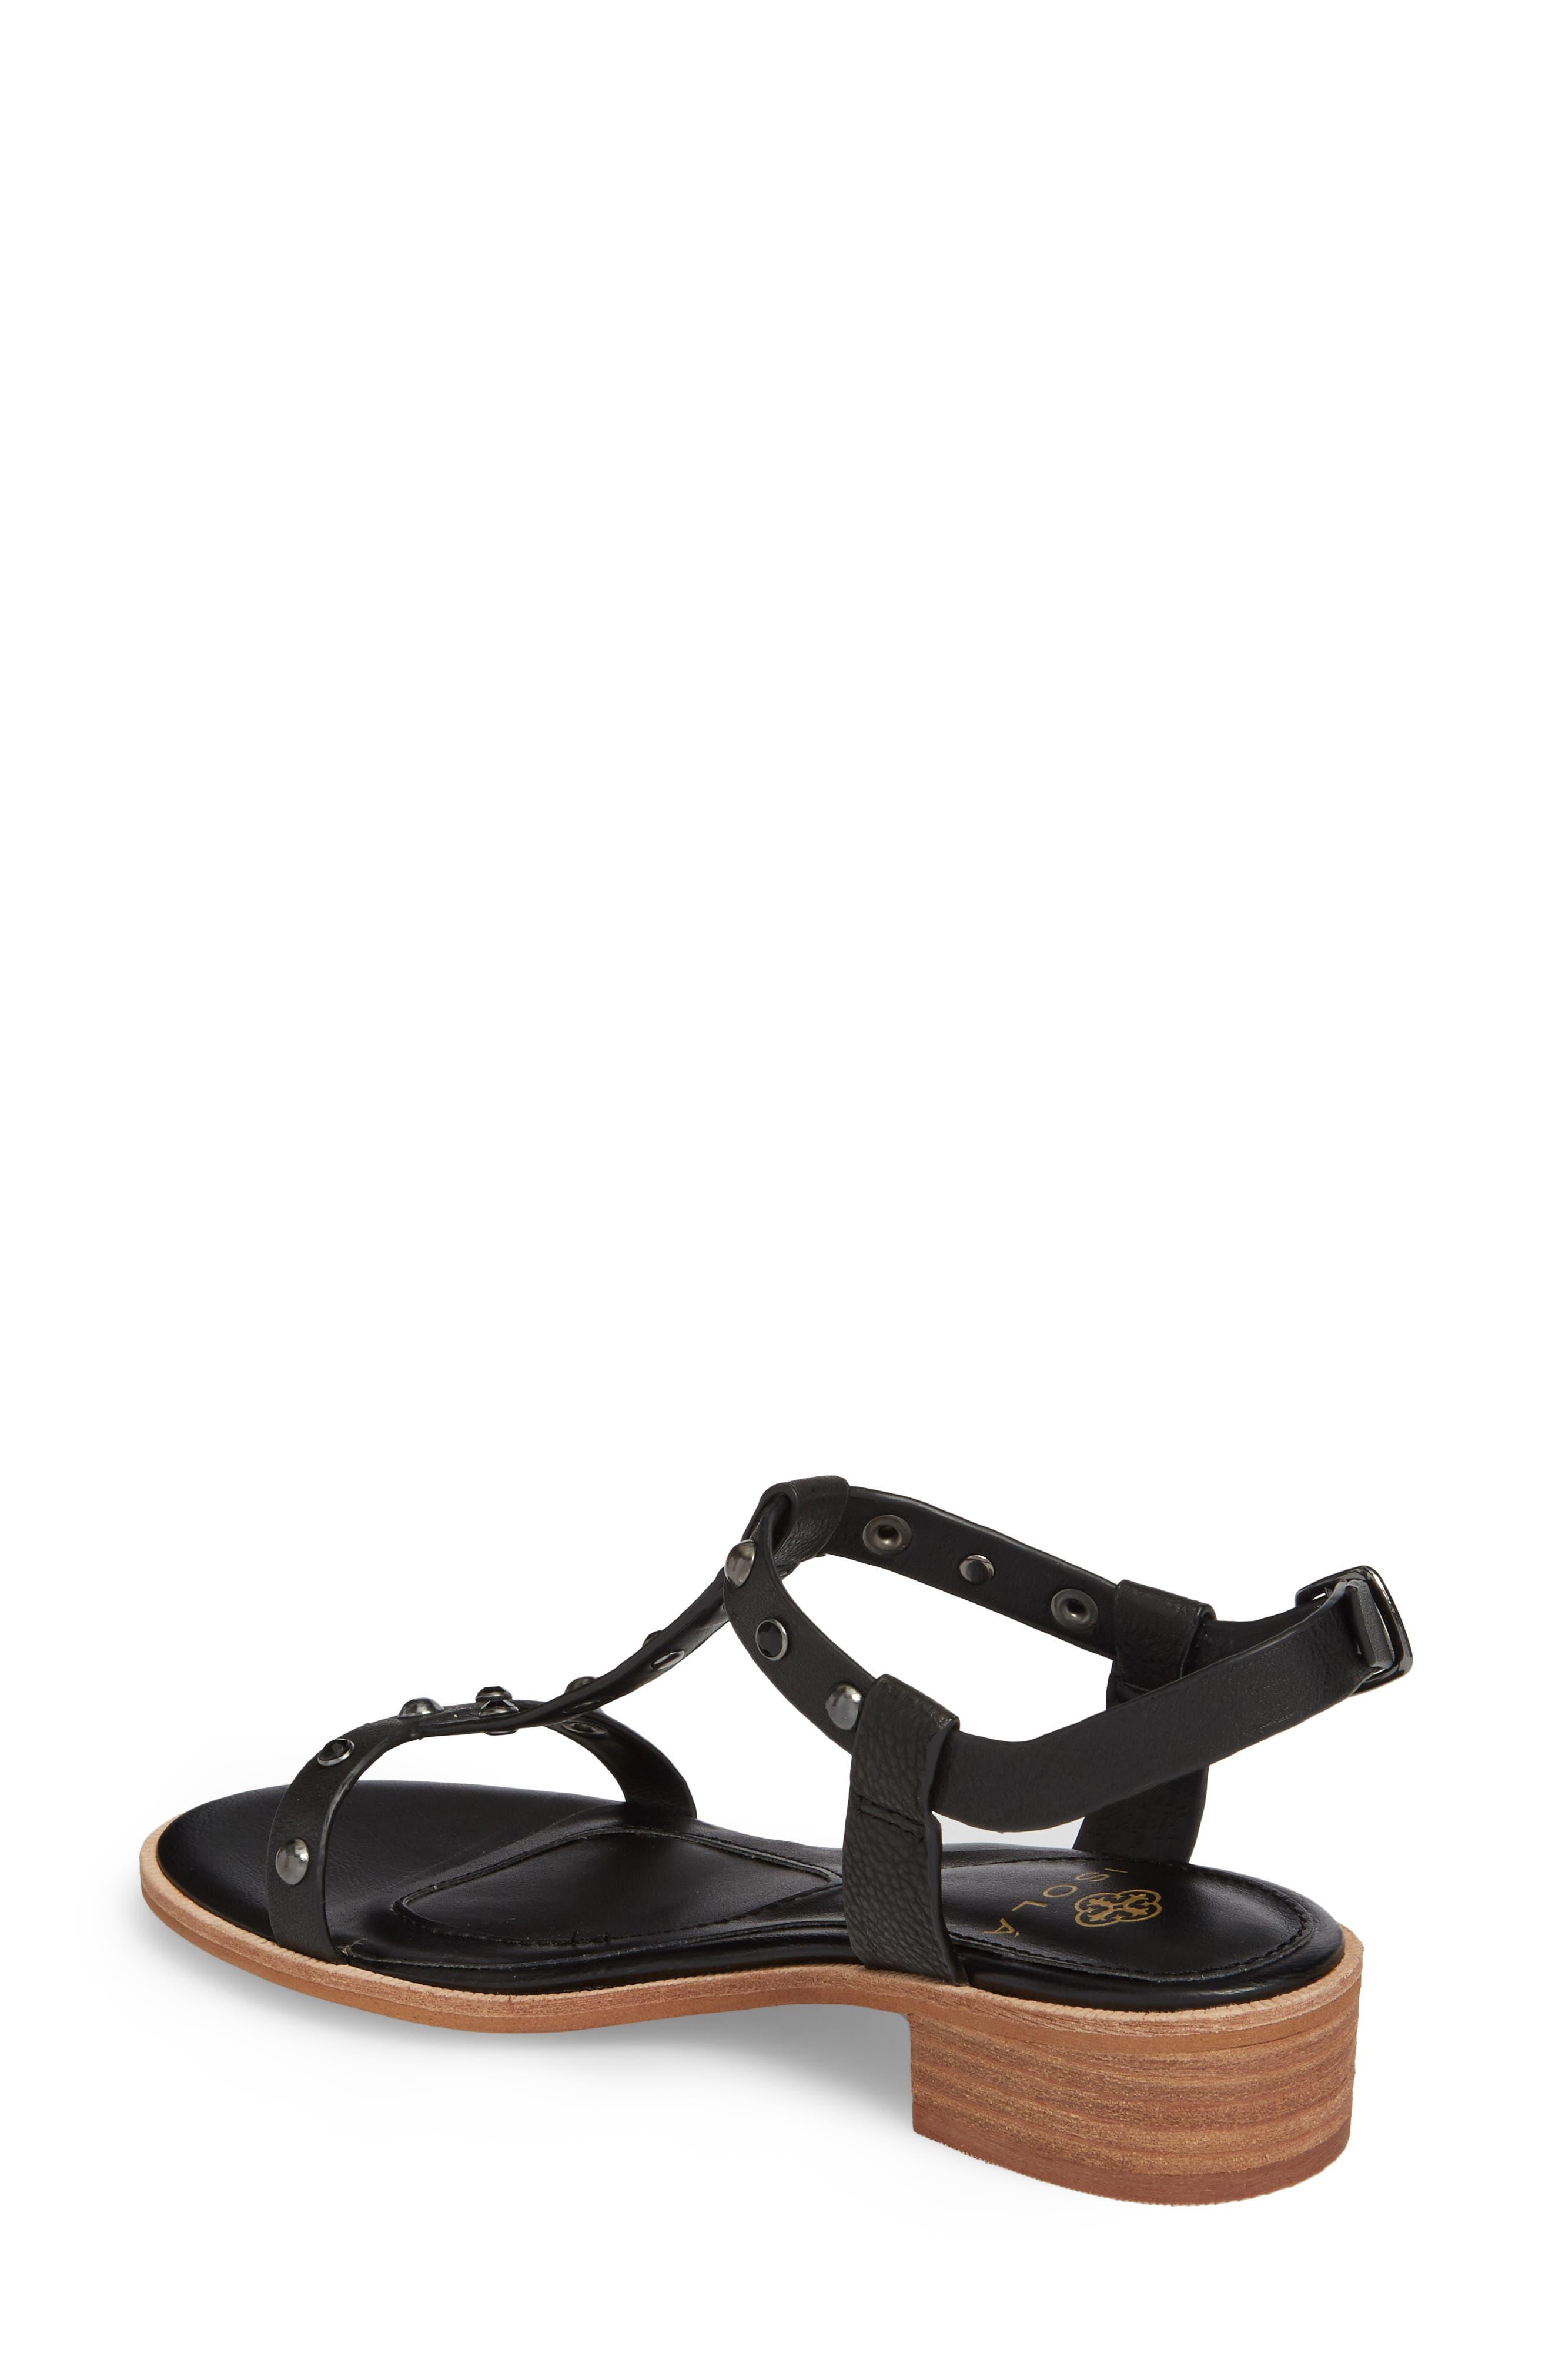 Giana Studded Sandal,                             Alternate thumbnail 2, color,                             BLACK LEATHER